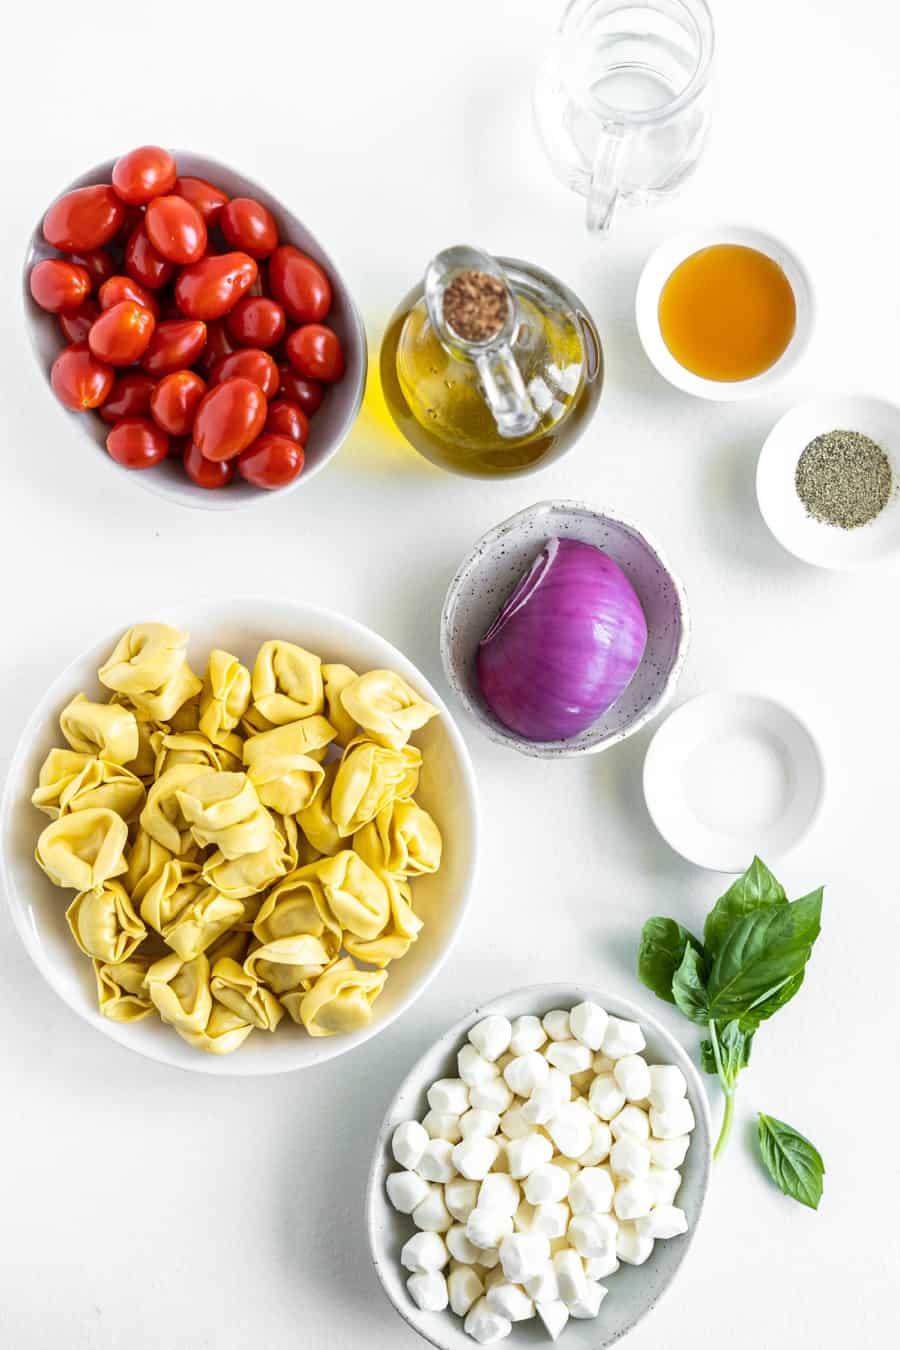 ingredients for tortellini salad